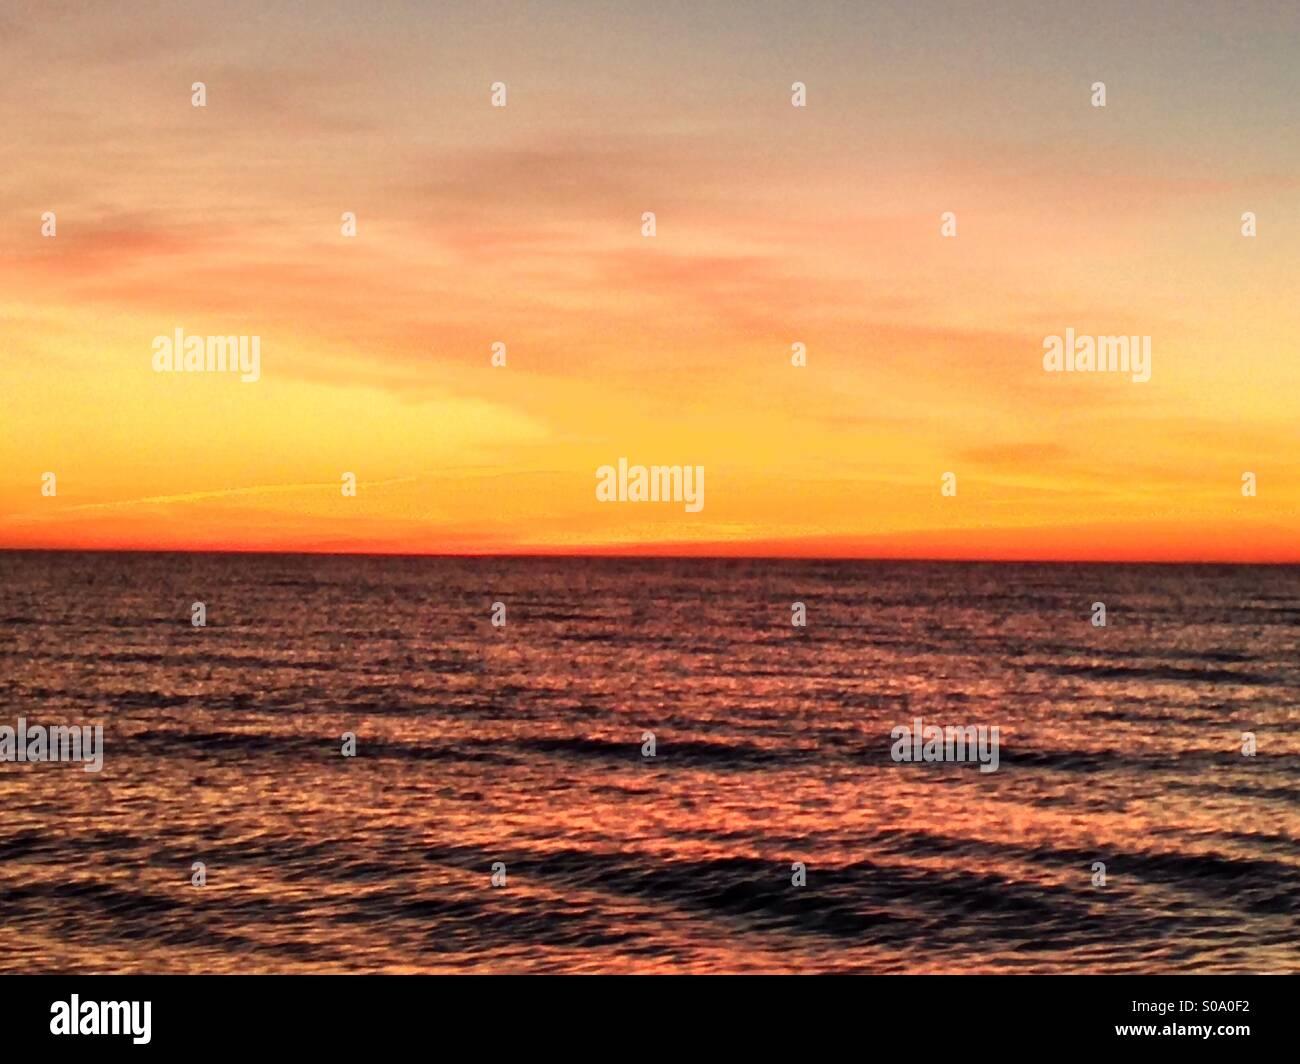 Sunset Marco Stock Photo: 310006566 - Alamy